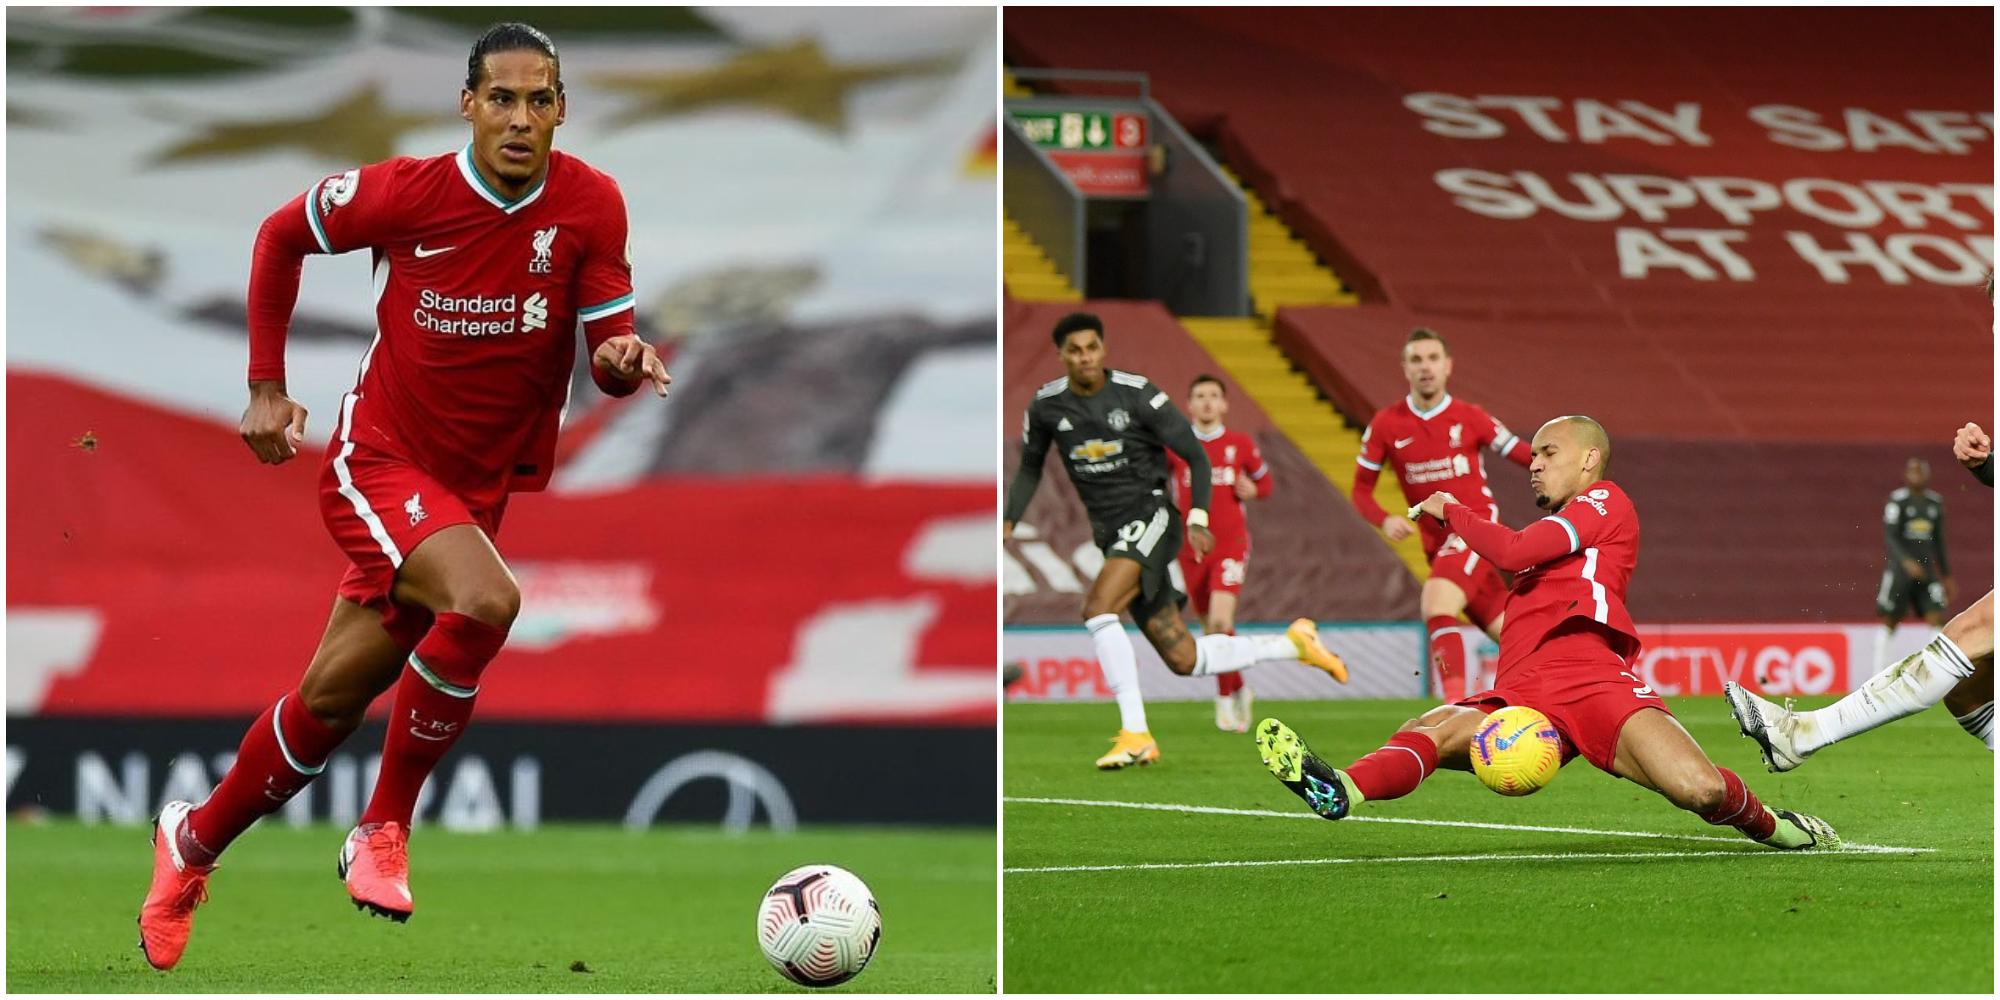 Fabrizio Romano drops major contract update on two key Liverpool stars